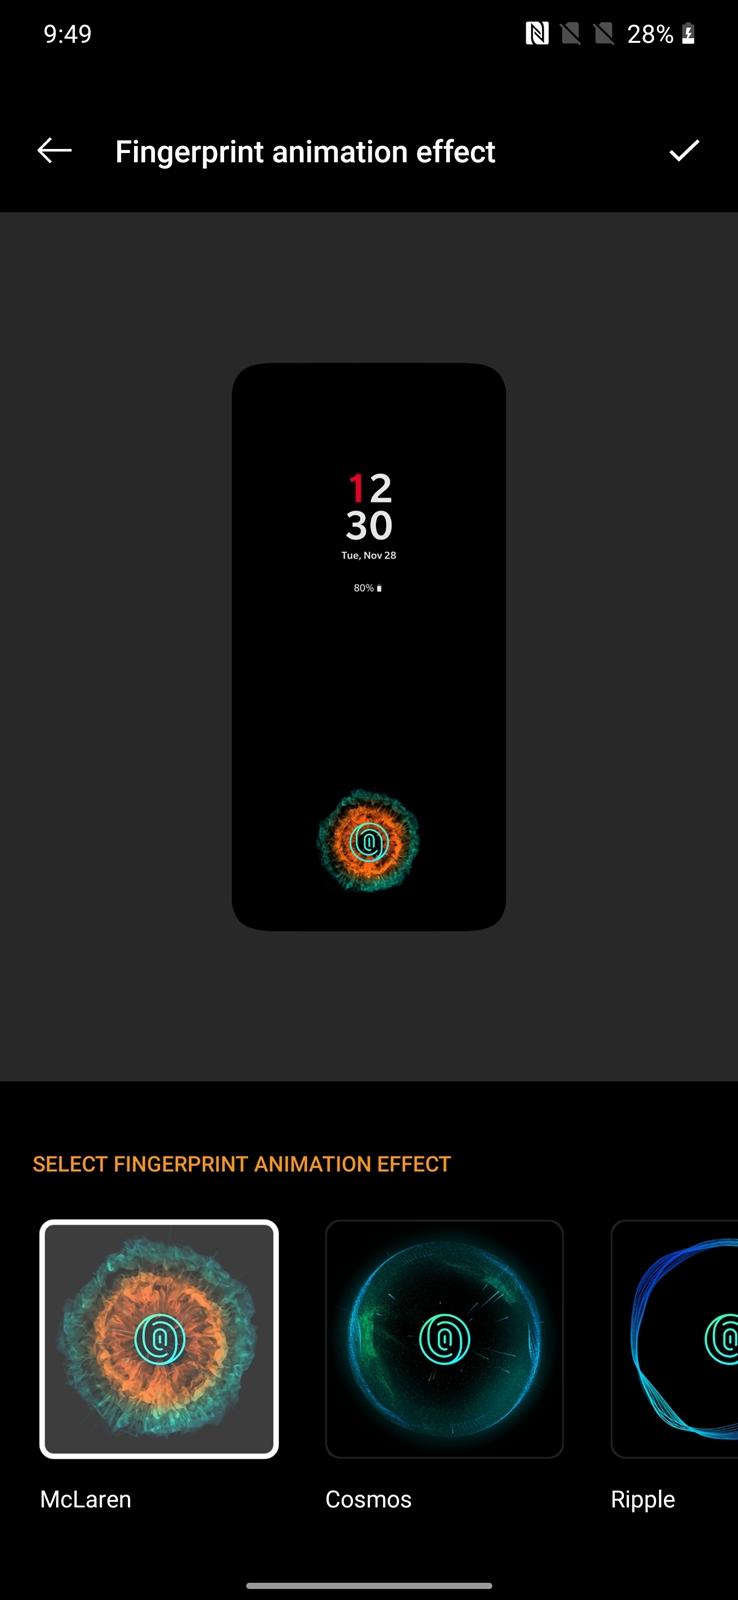 OnePlus 7T Pro McLaren fingerprint McLaren